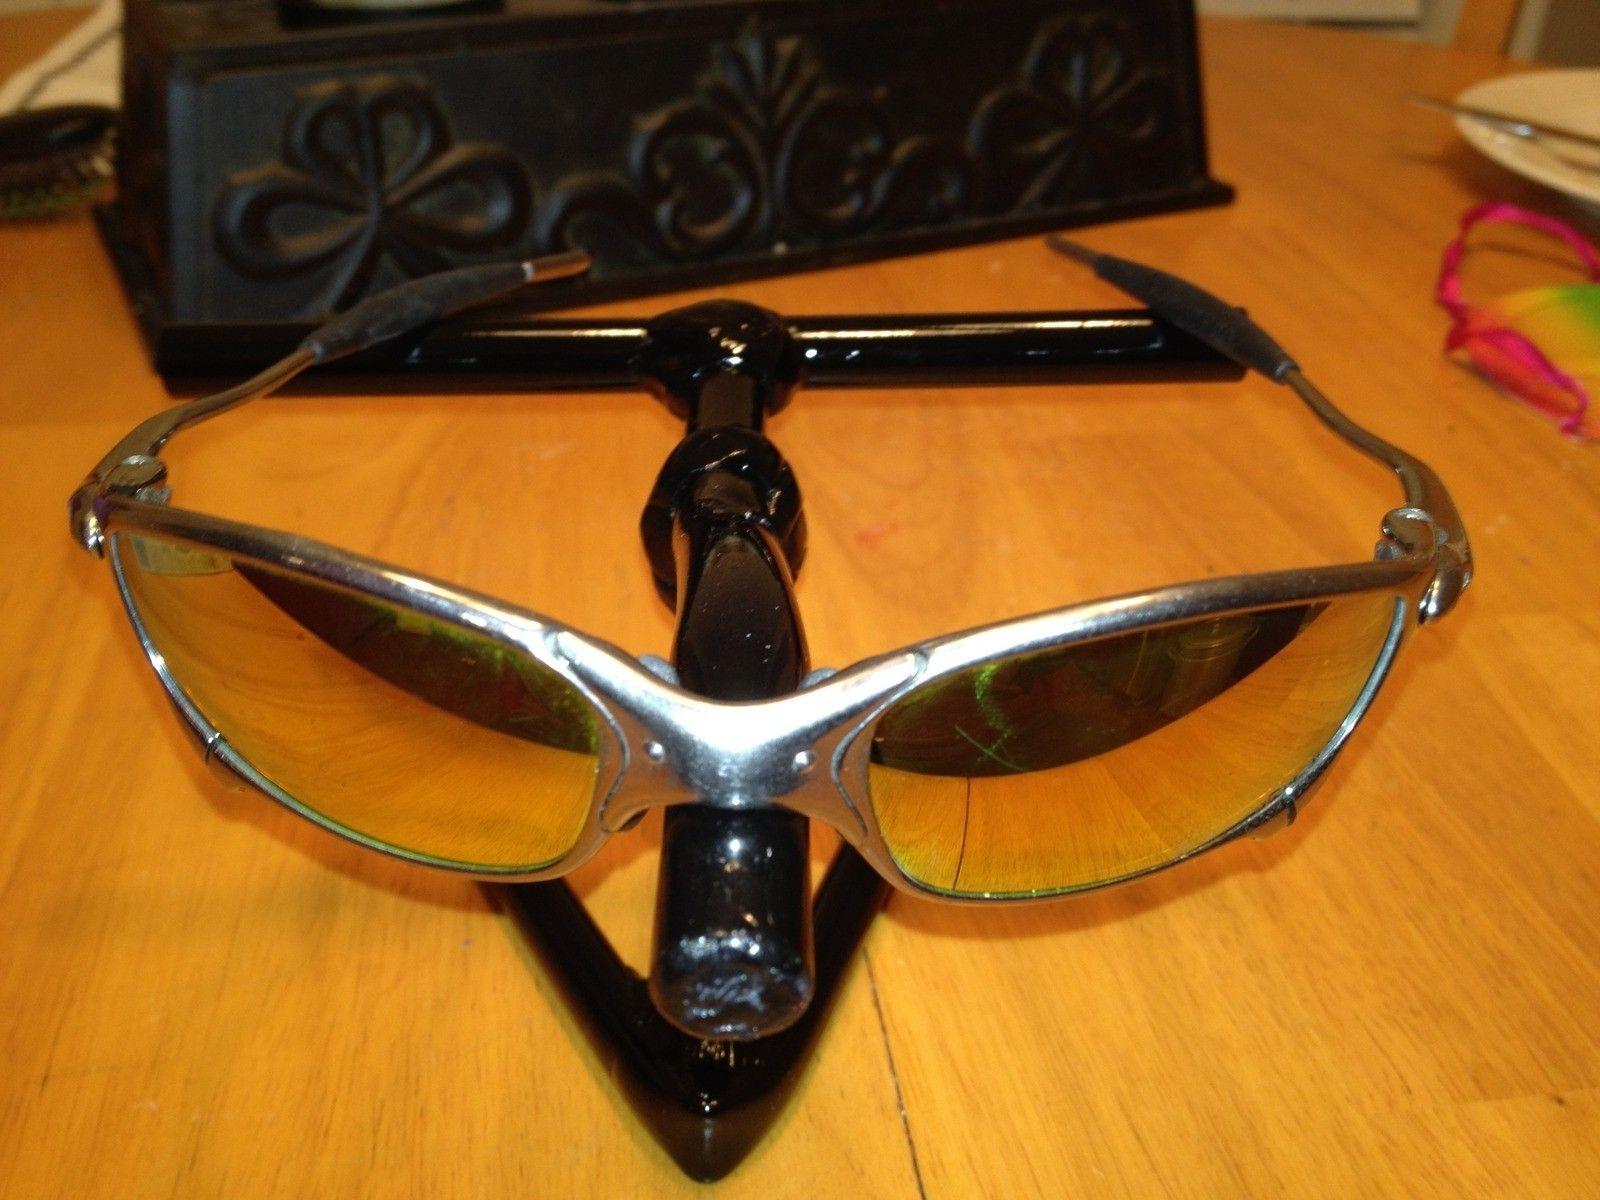 First pair of Juliet's from Craigslist - 9cyPX4m7_original.jpg